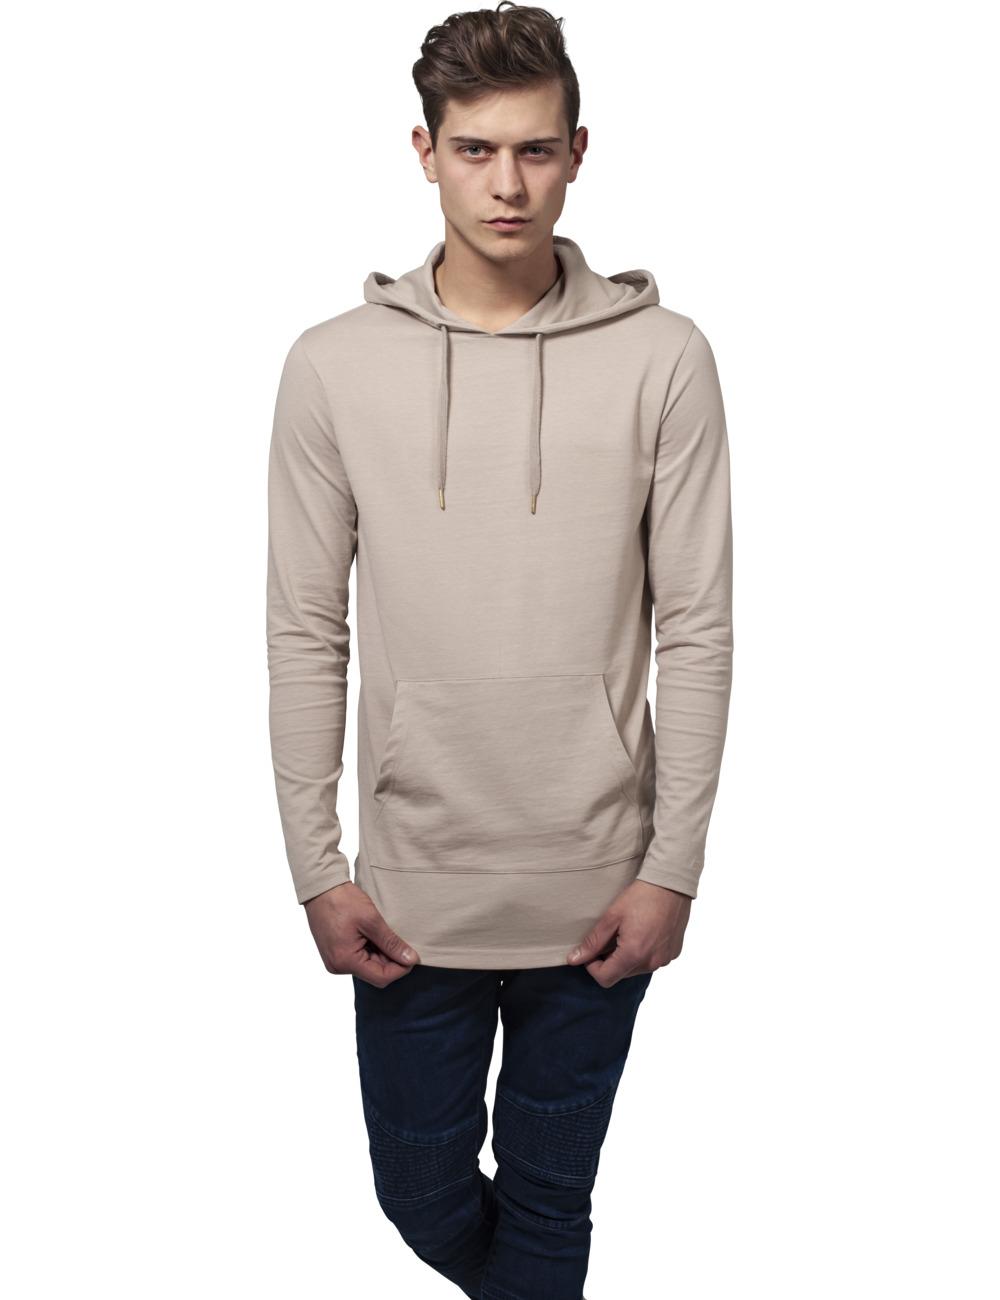 Urban Classics Herren Kapuzensweater Jersey Hoody XXL, Sand (208)